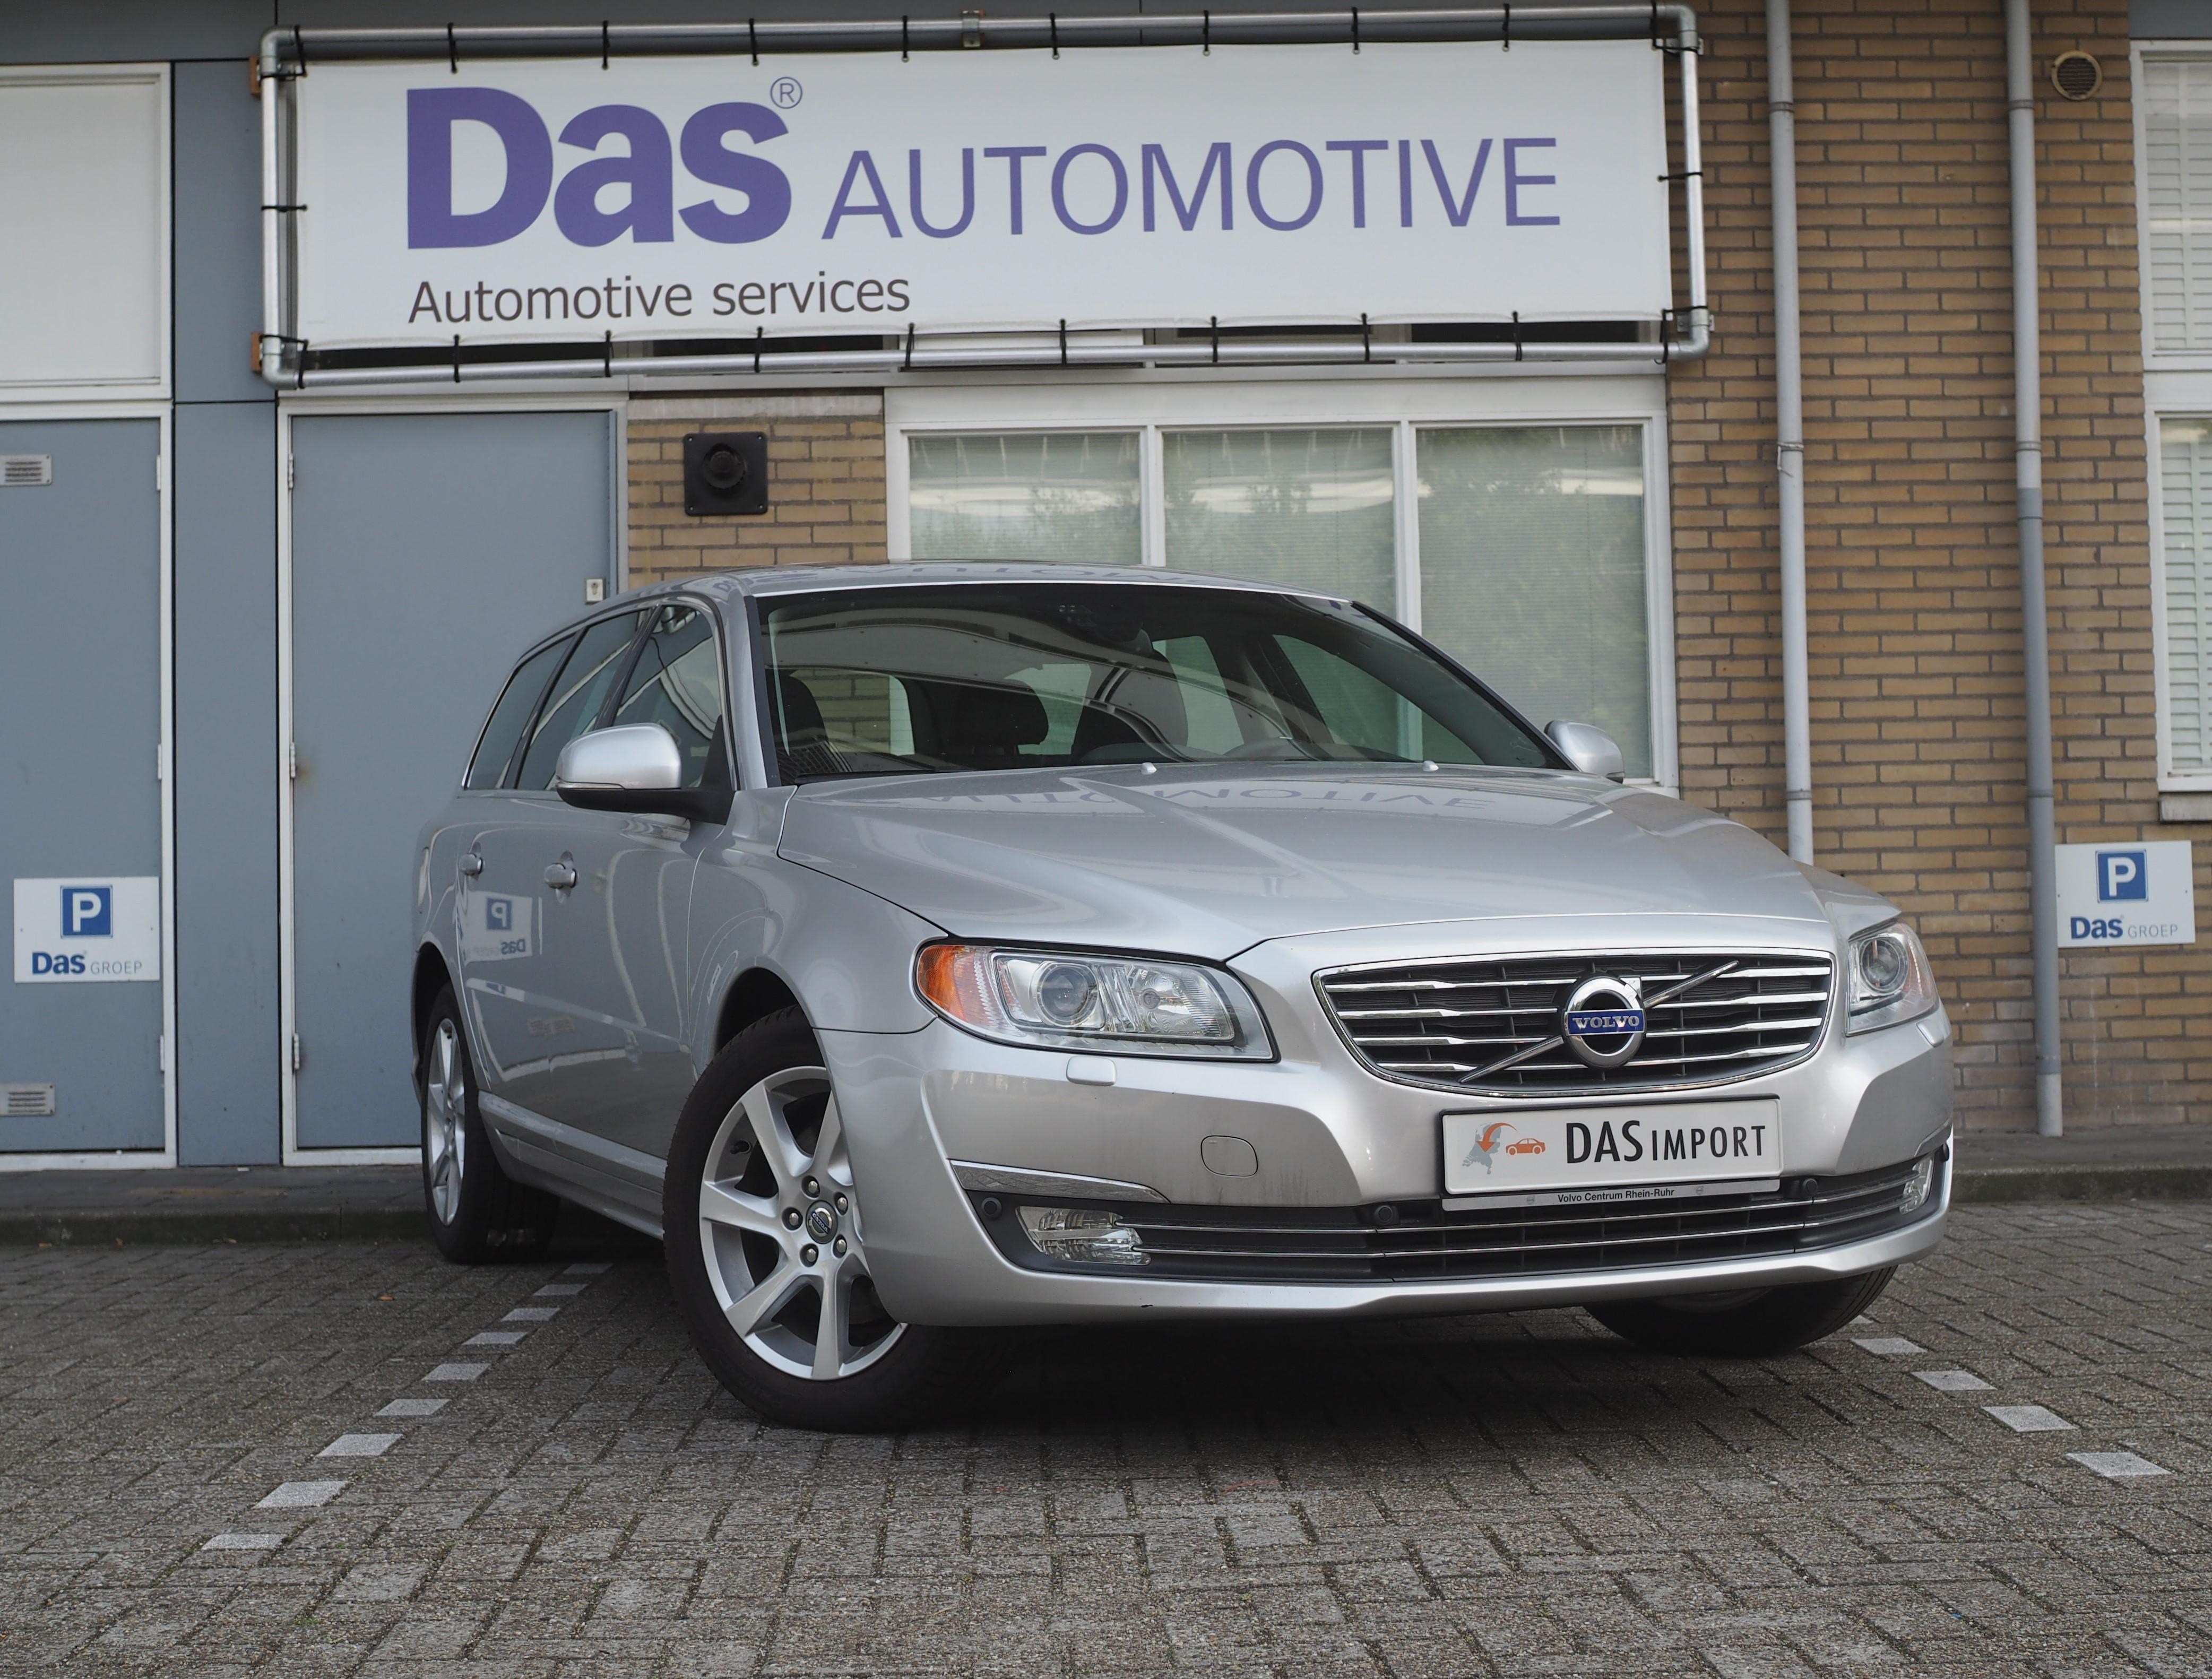 Importauto: Volvo V70 2.0 D4 Momentum 11/2013